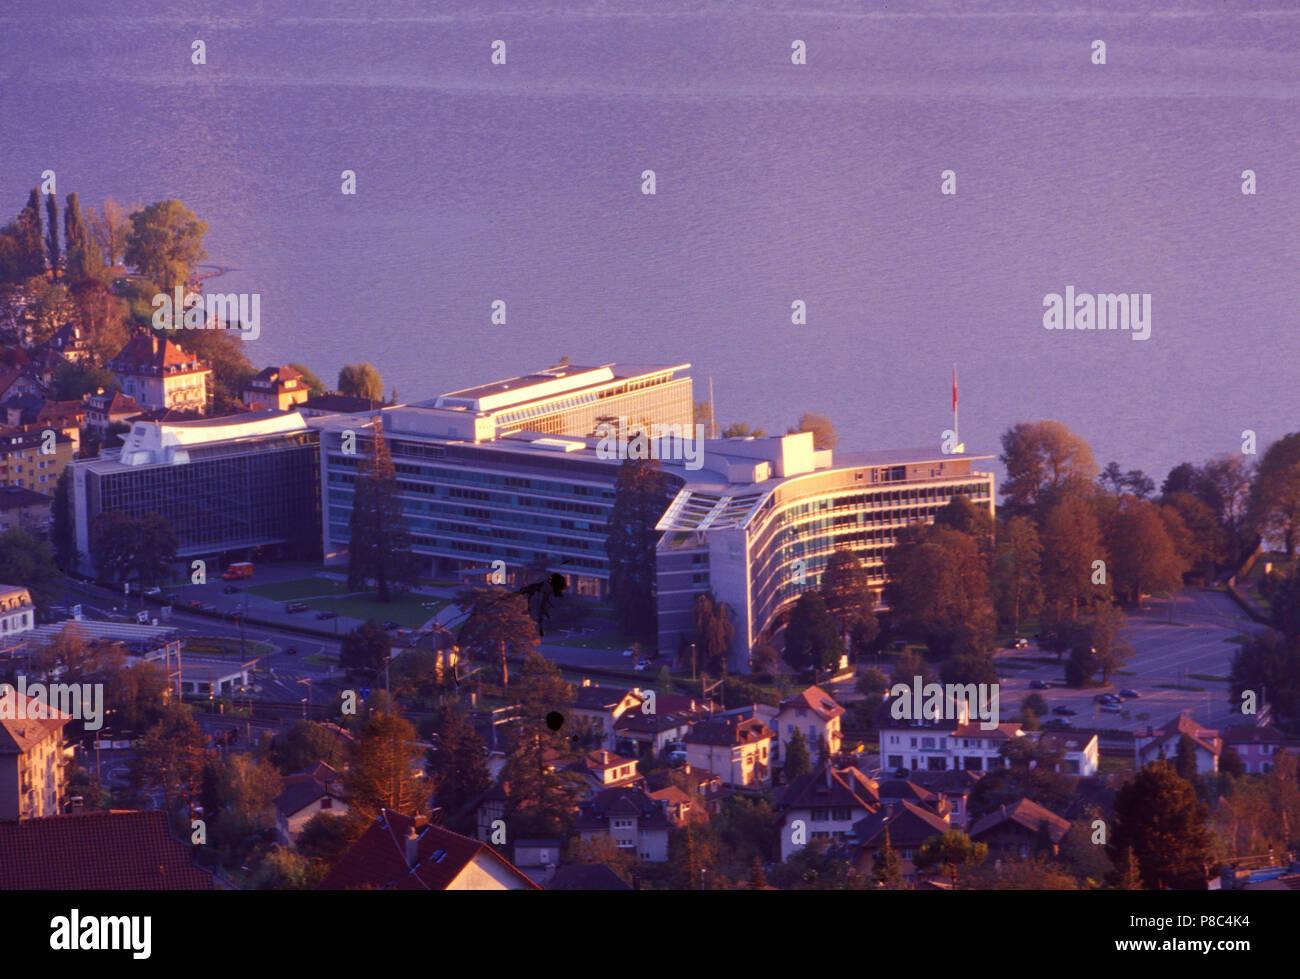 Switzerland: The headquarter of the Food Multi Nestlé in Vevey at Lake Geneva - Stock Image